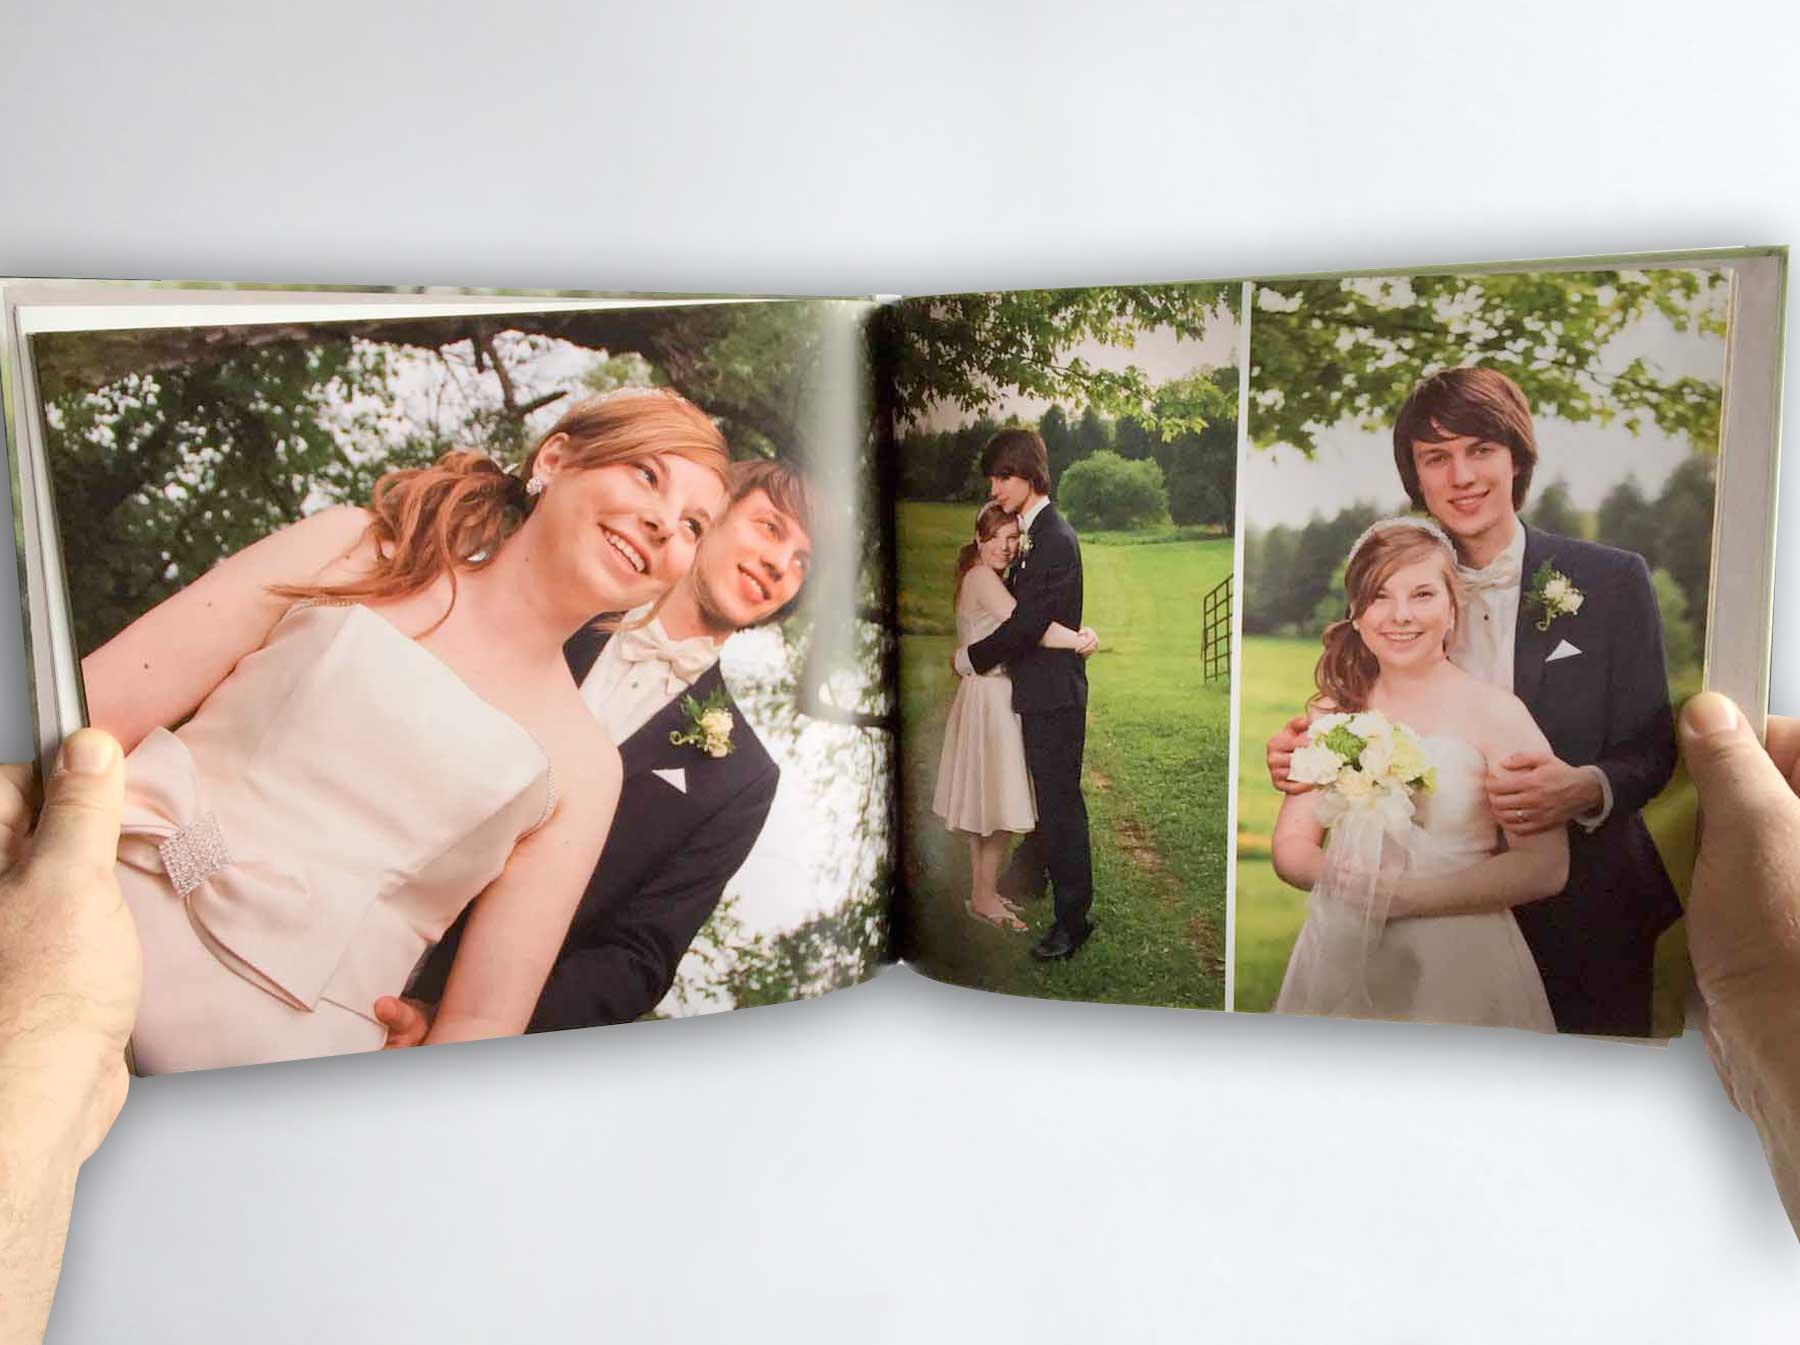 A coffee table book style wedding album  - Print Media